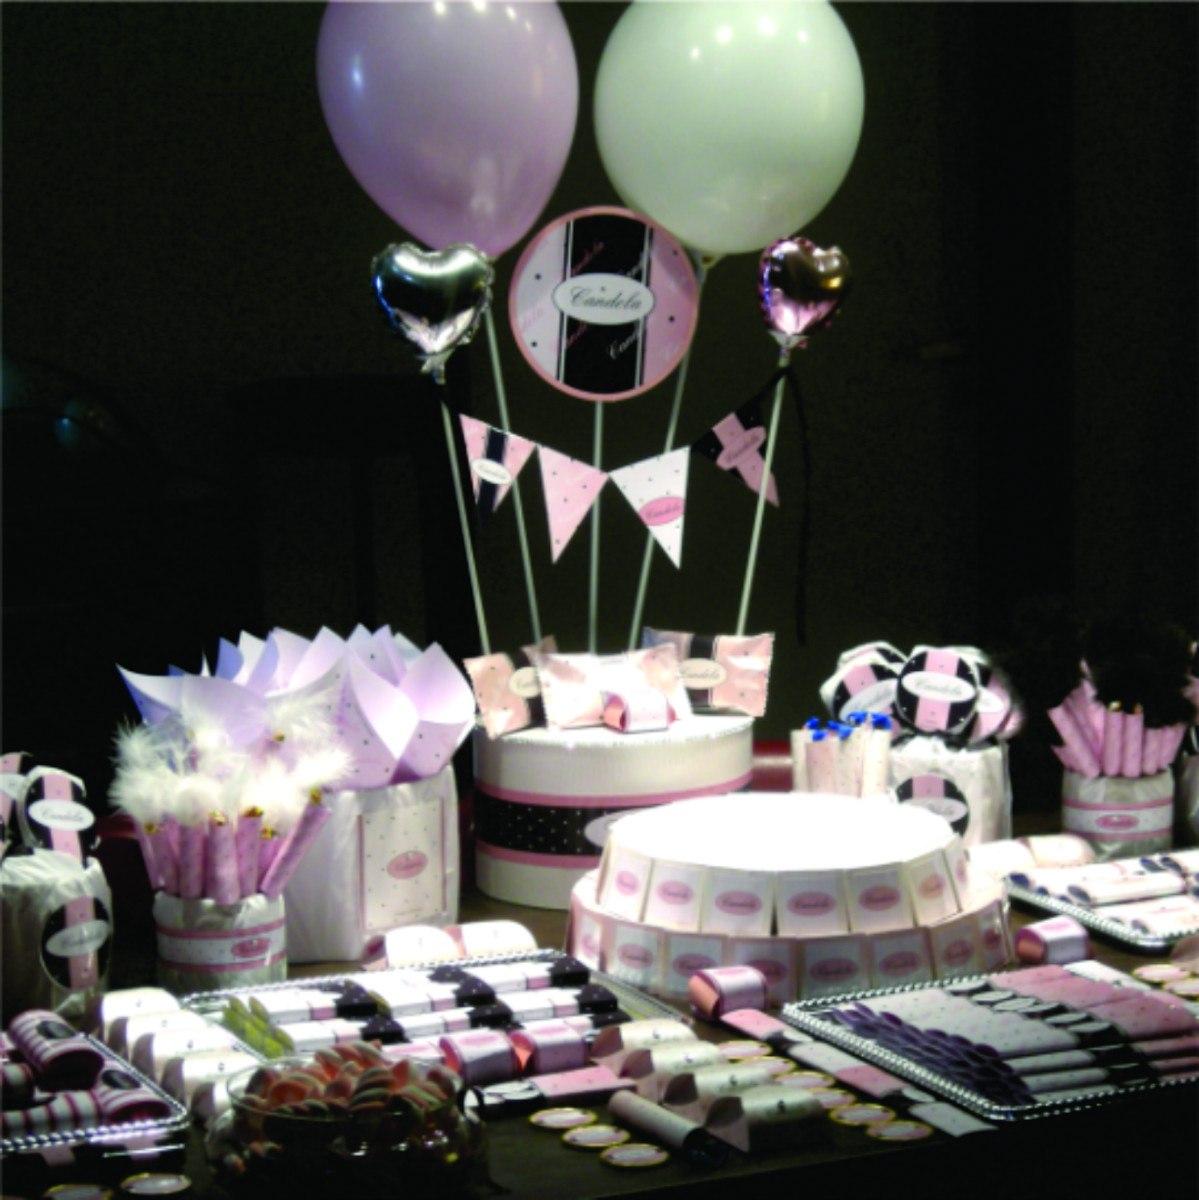 Como planear una boda como planear una boda souvenirs - Como planear una boda ...